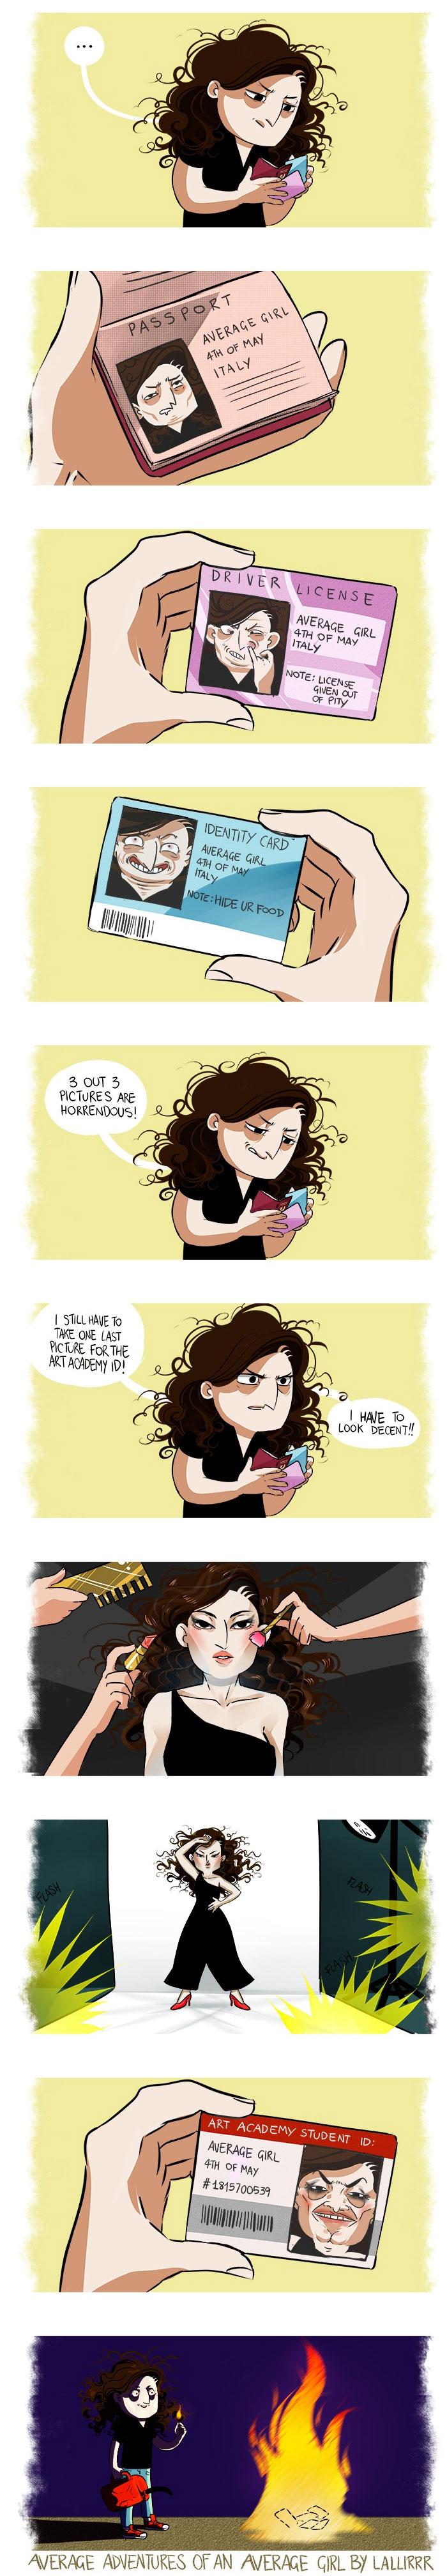 Average Girl Comic